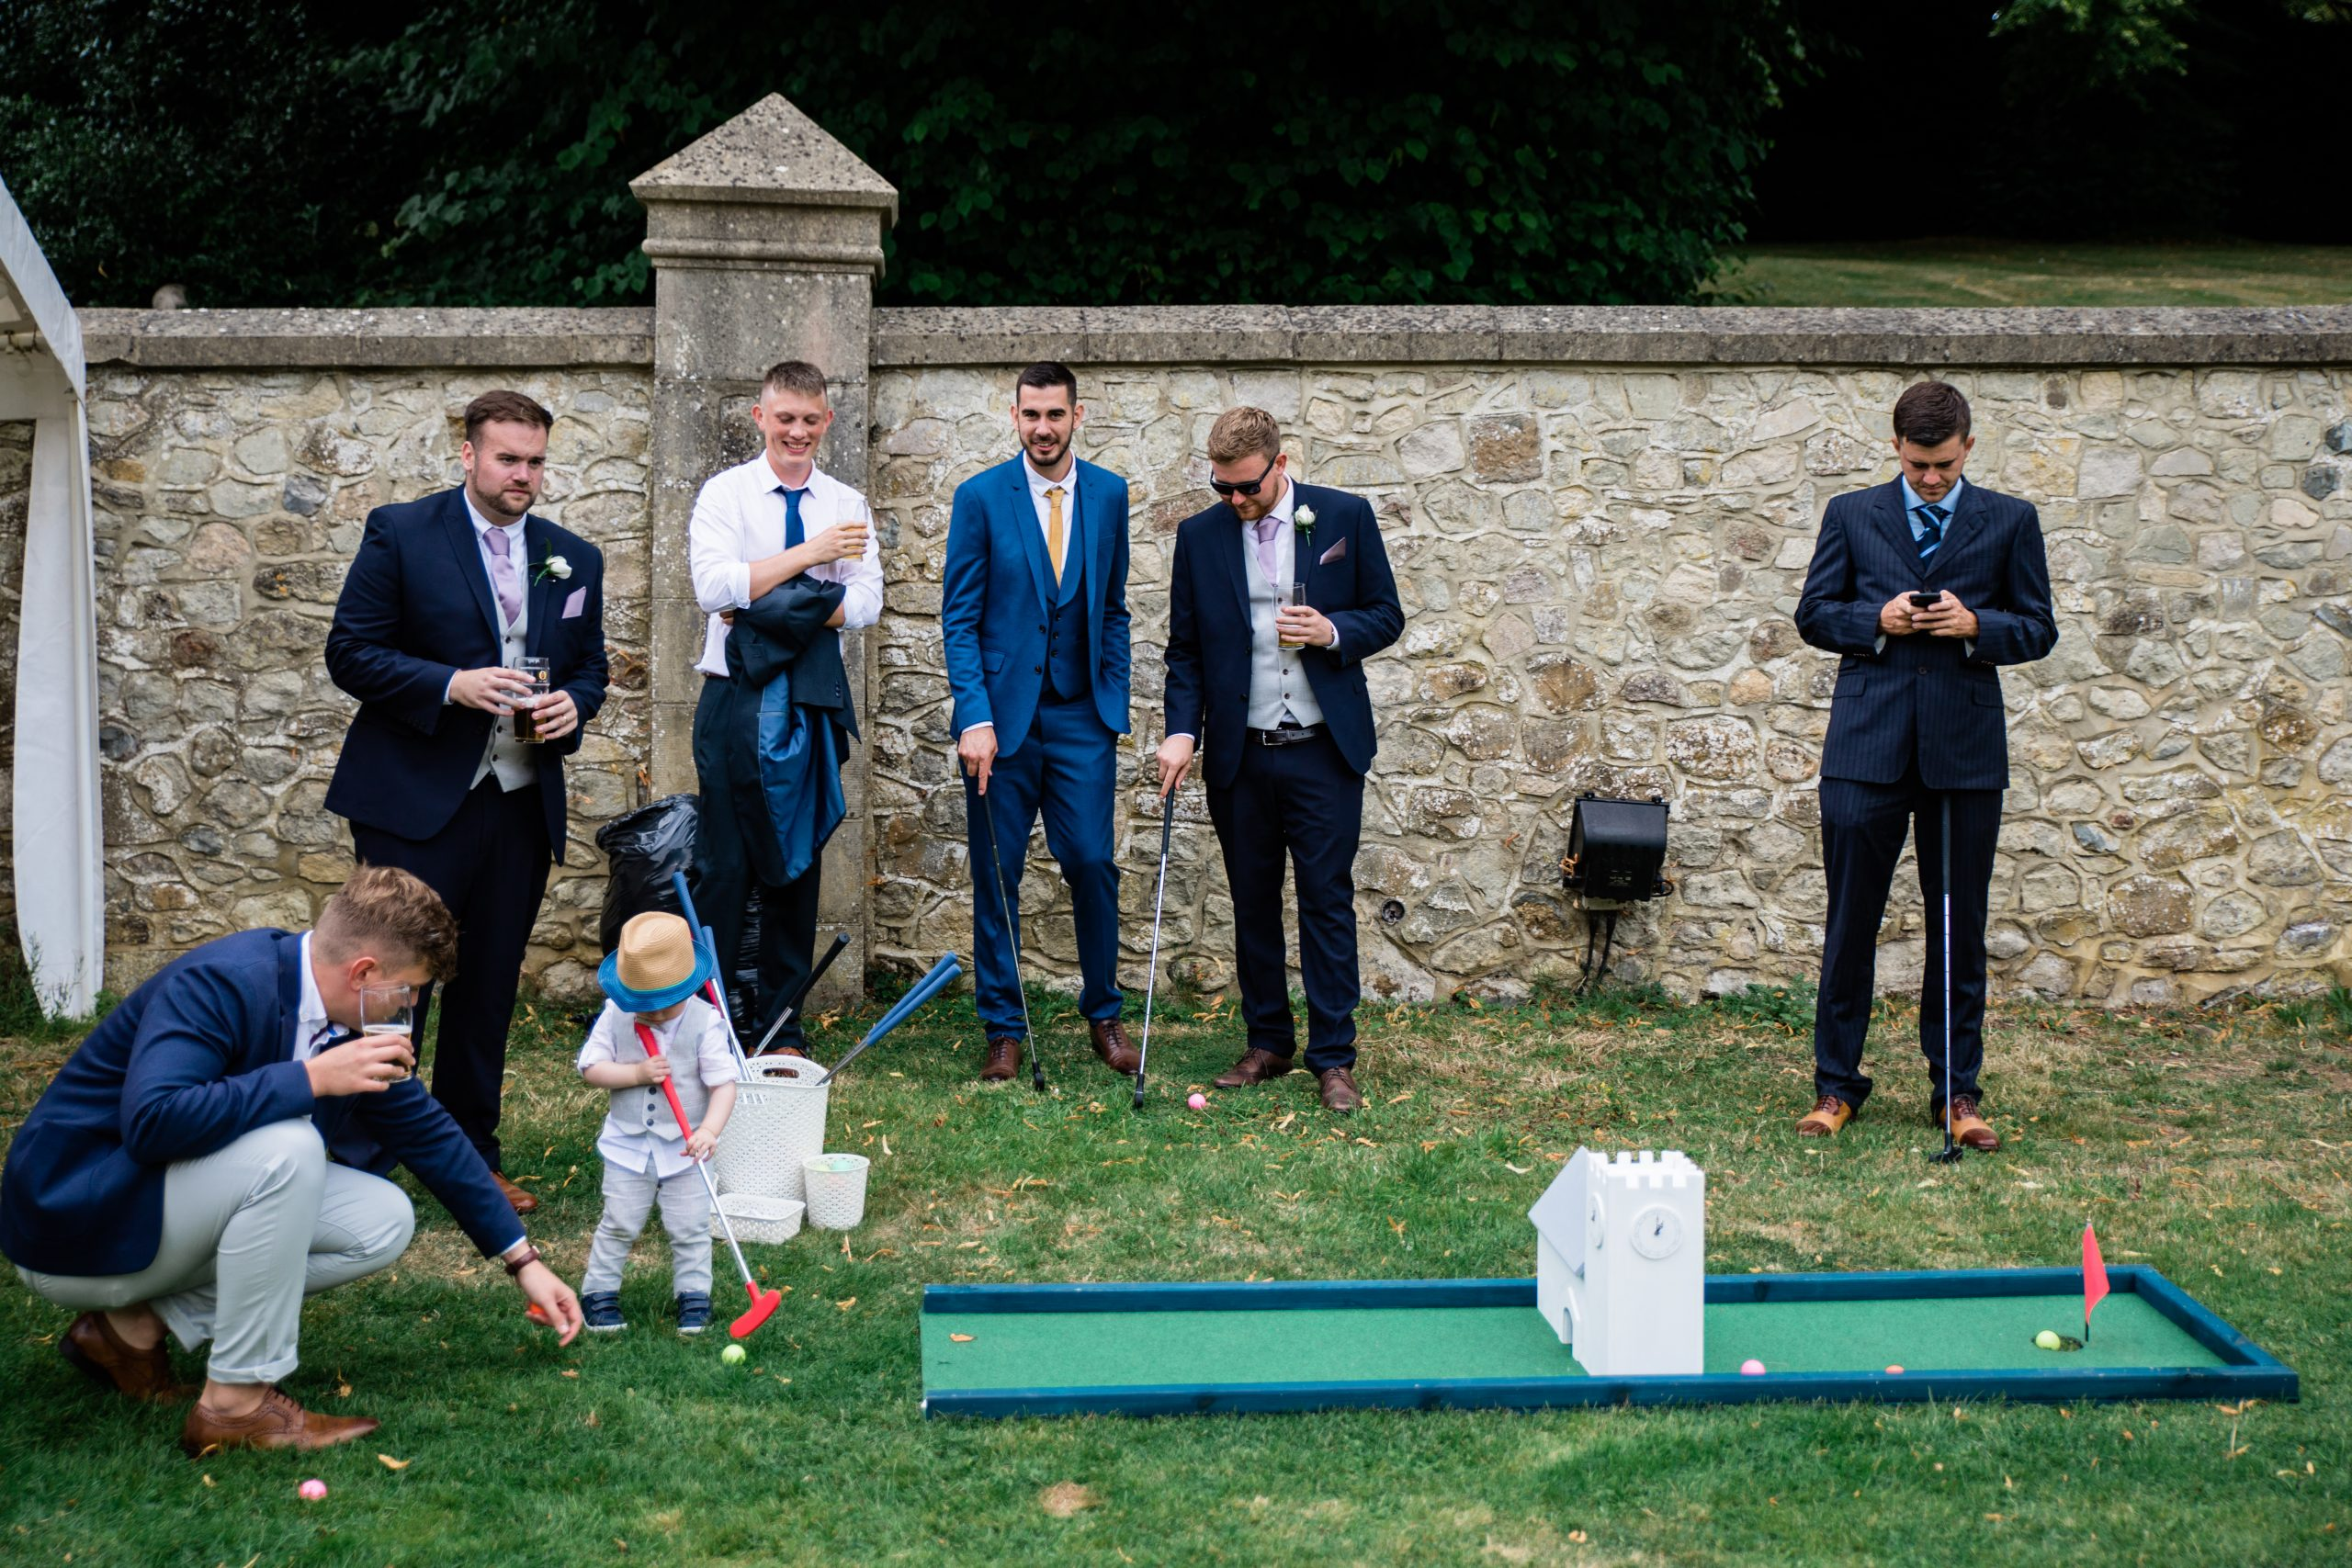 groomsmen and child playing mini golf